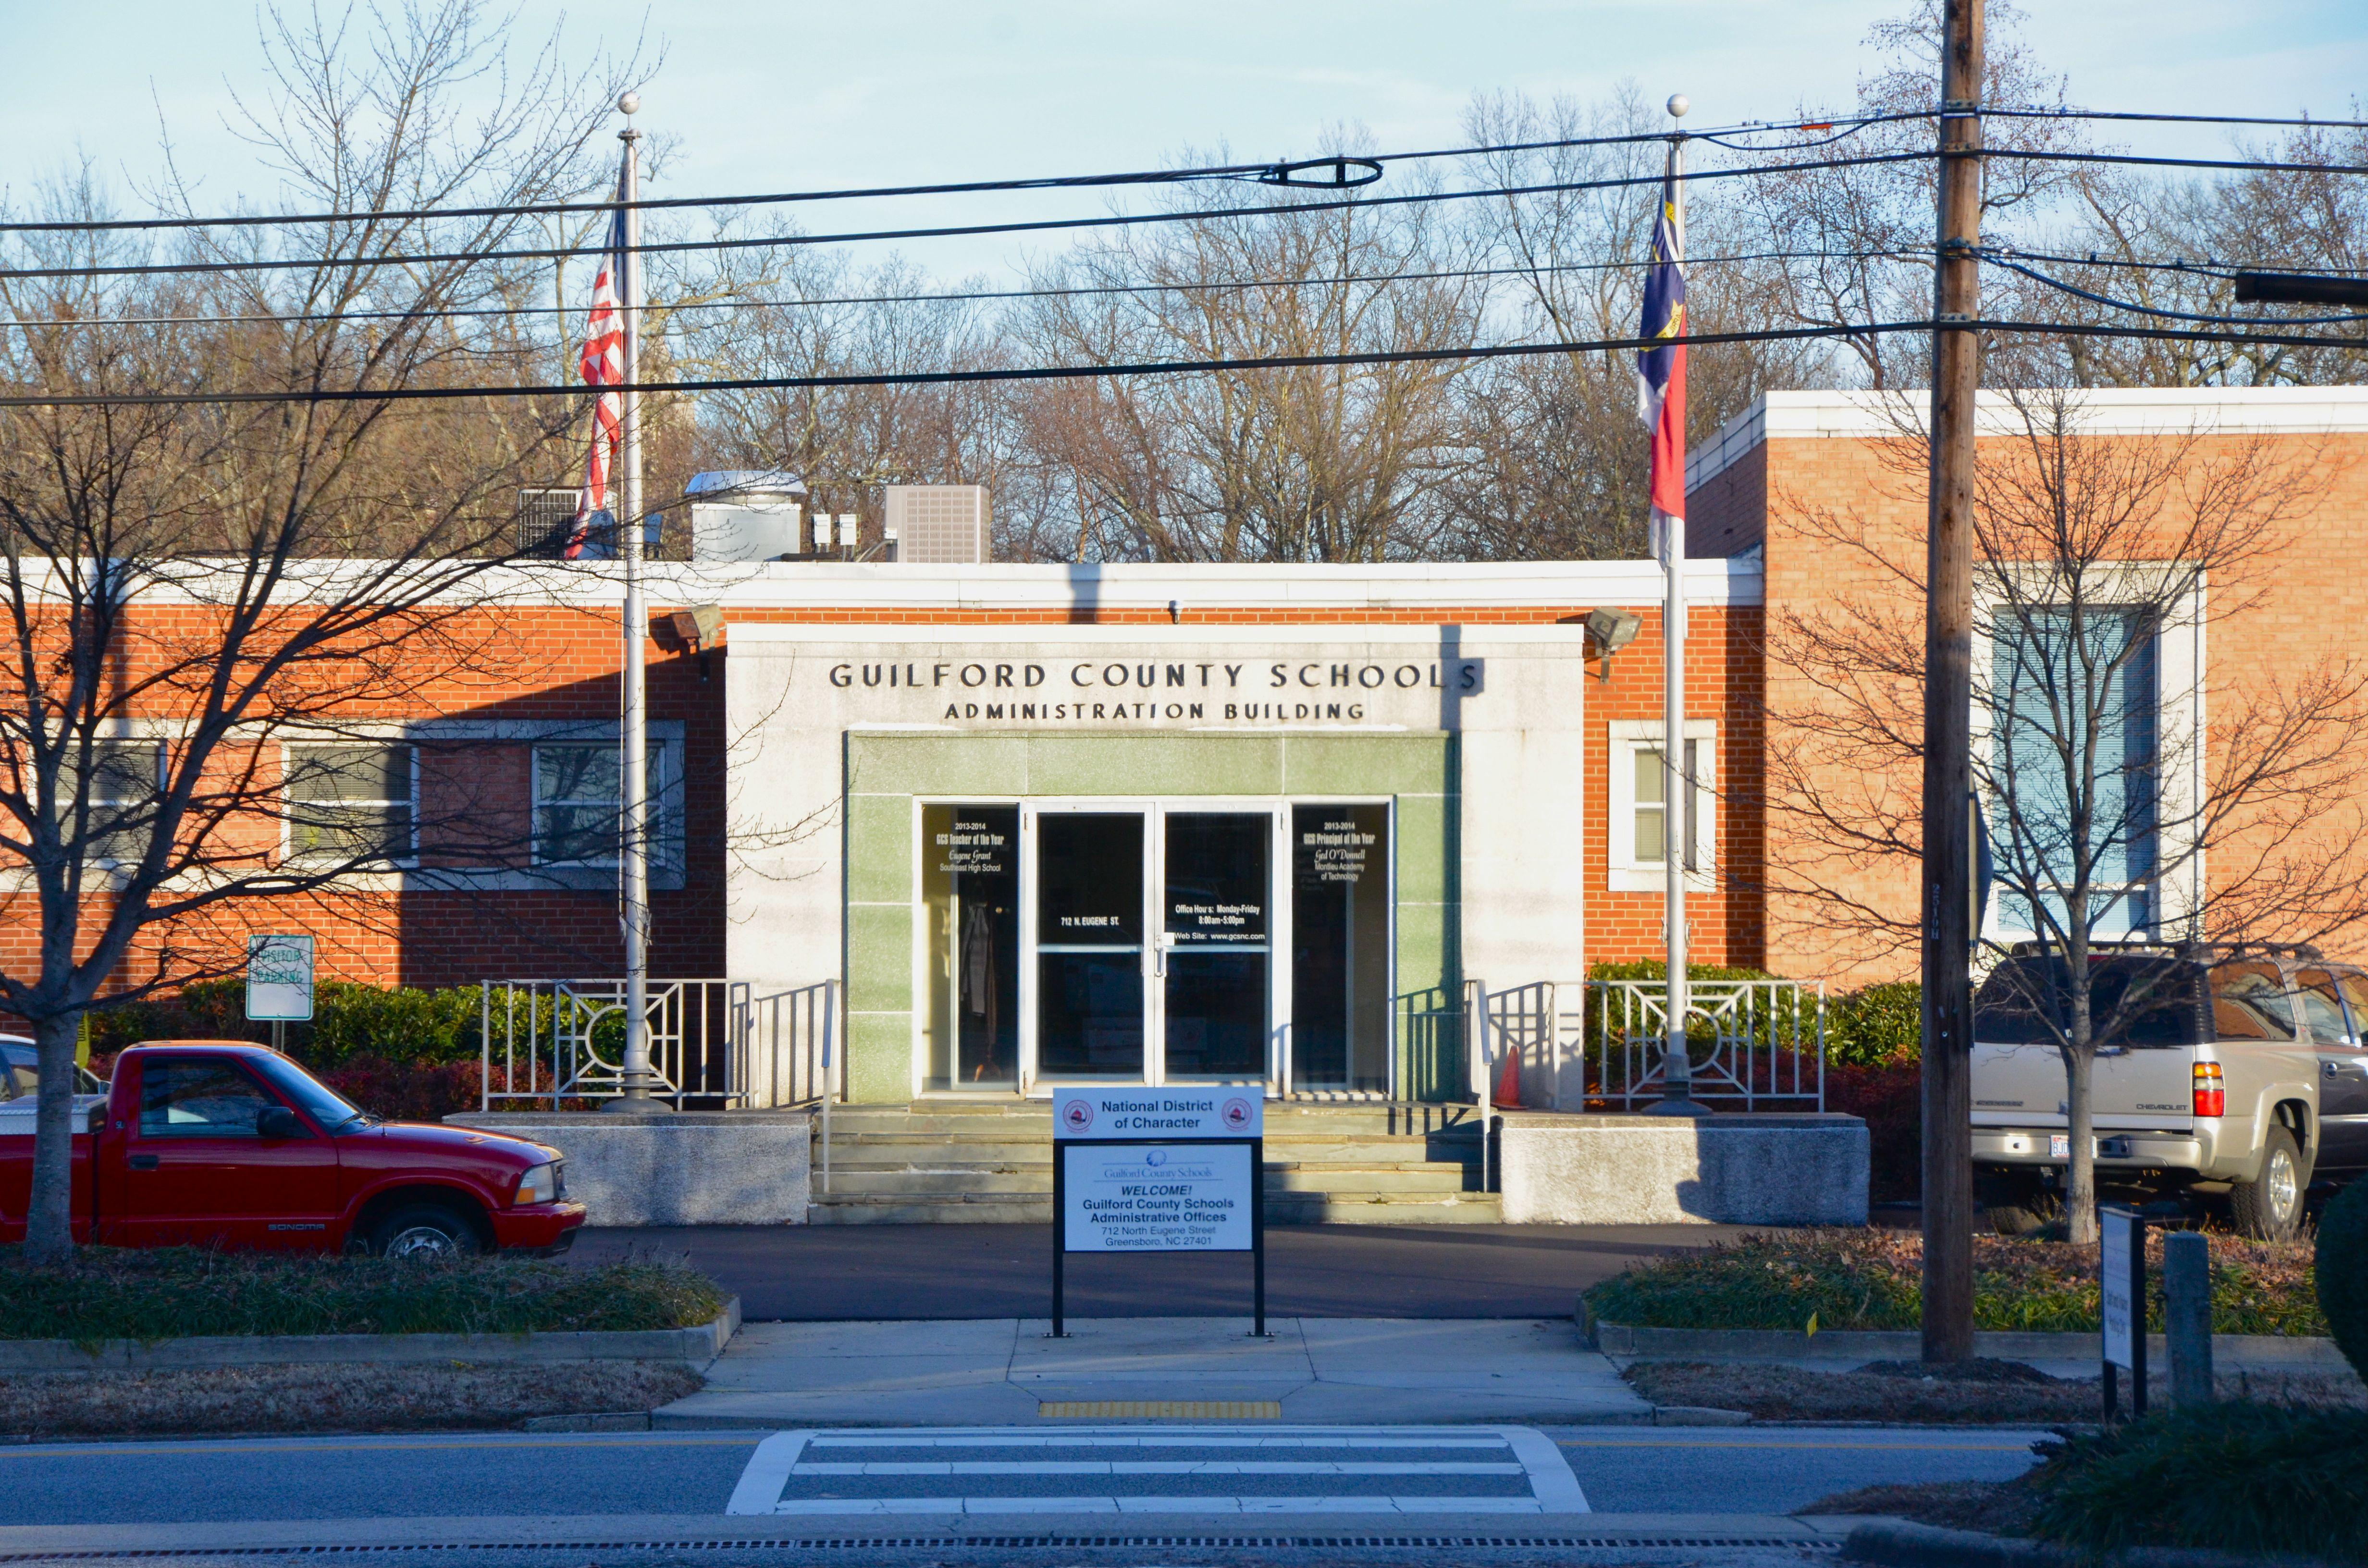 Greensboro Daily Photo: Buildings